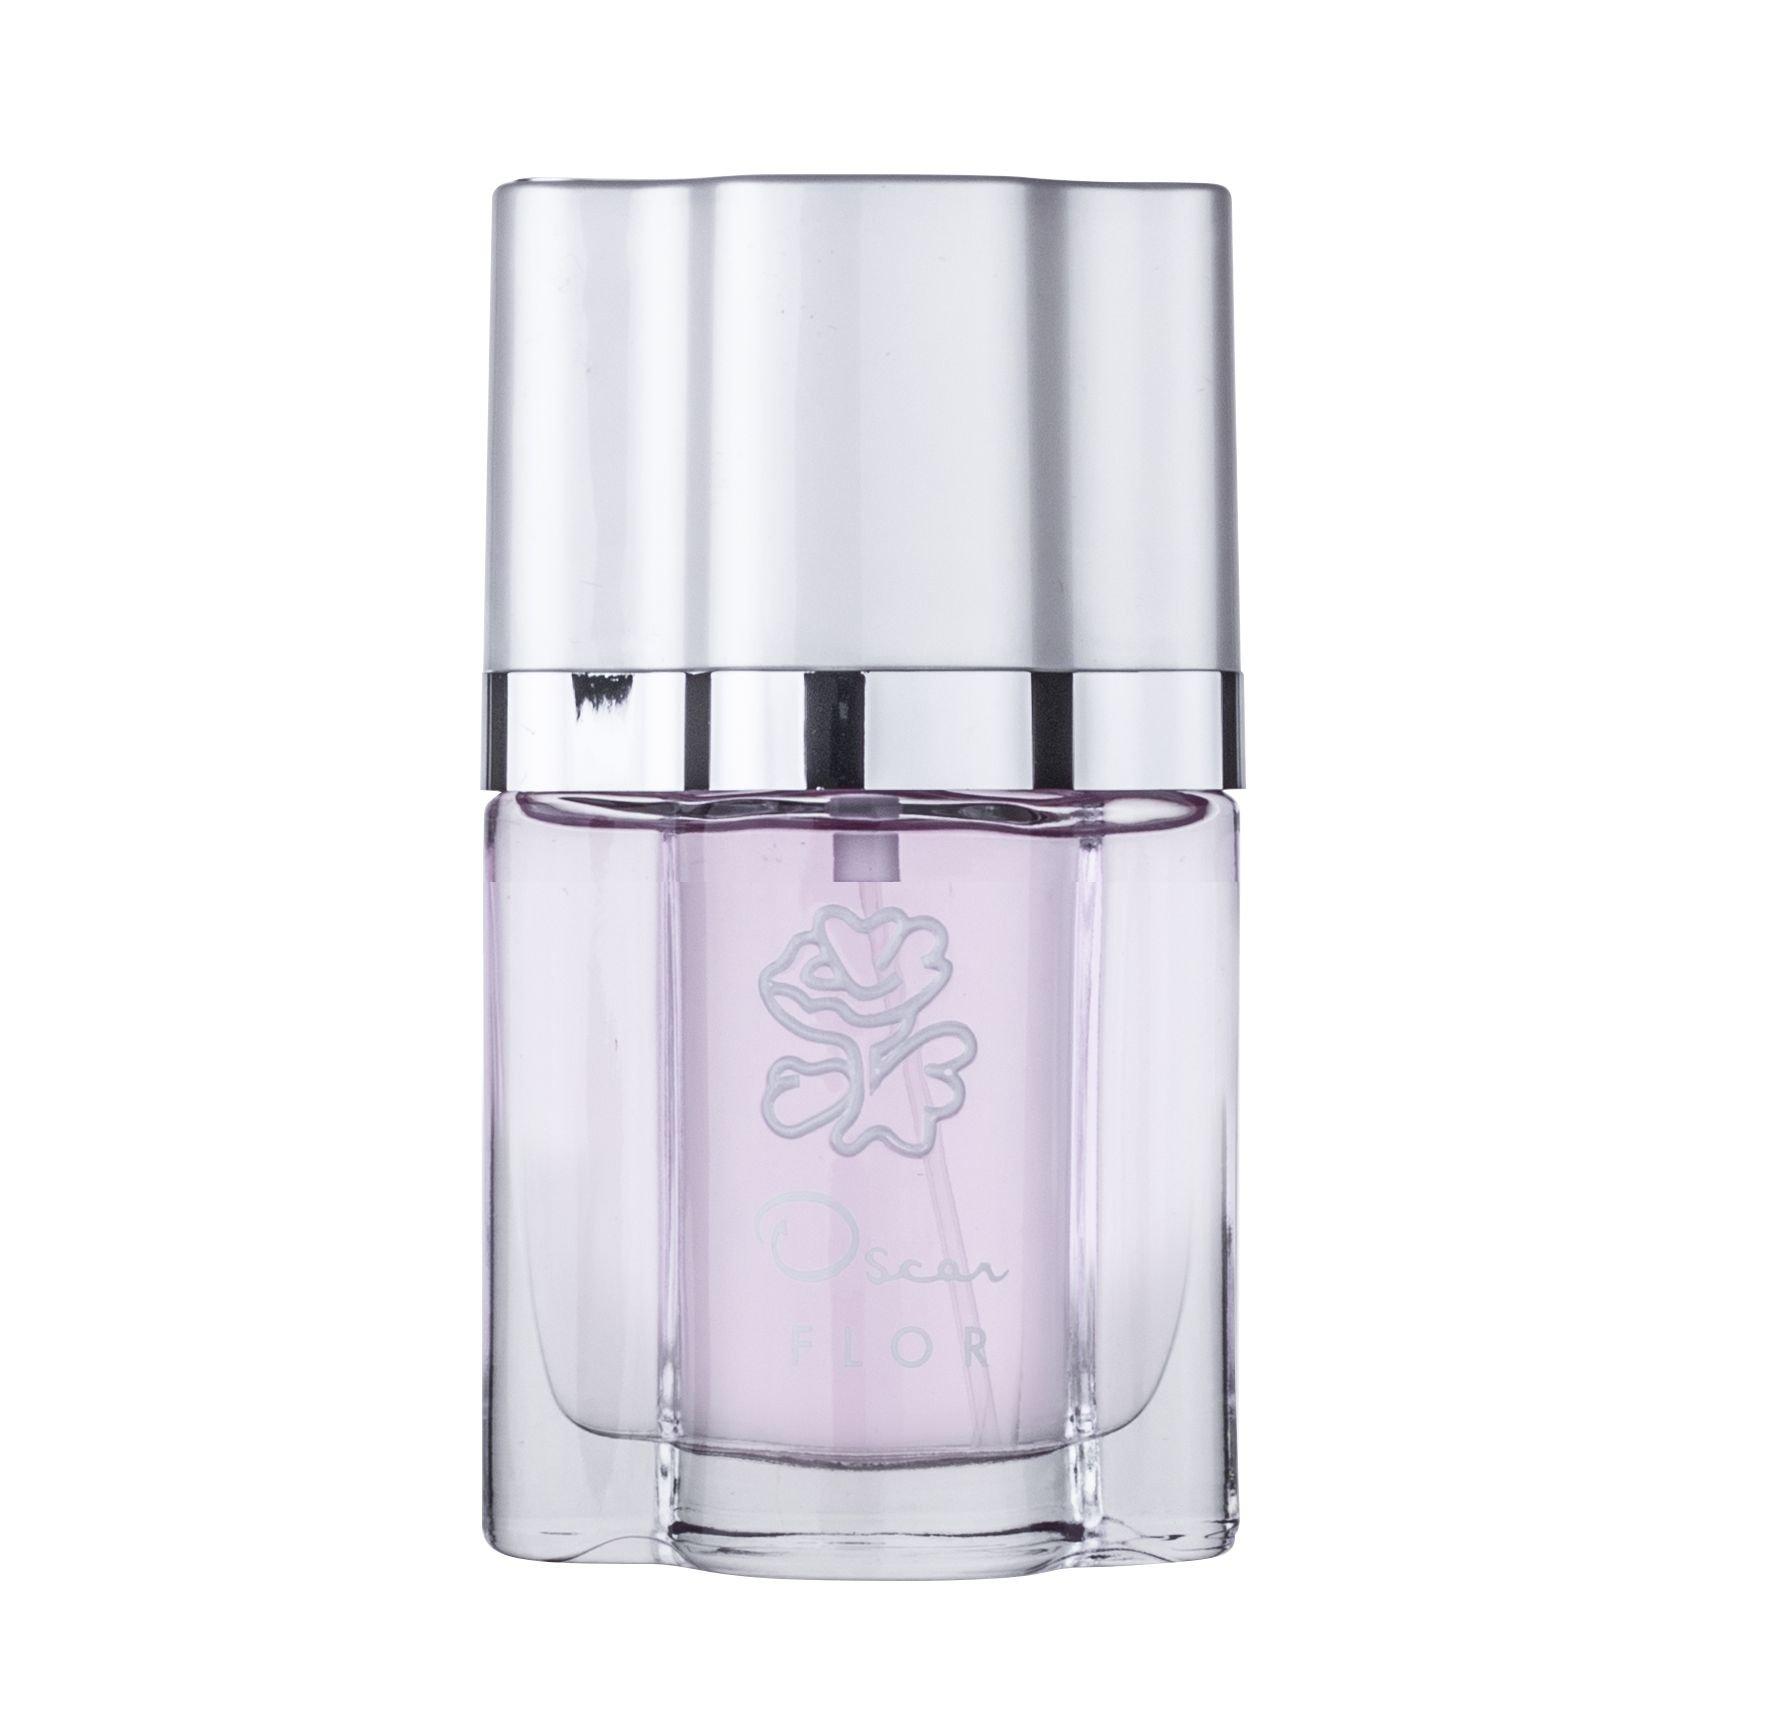 Oscar de la Renta Oscar Flor Eau de Parfum 30ml